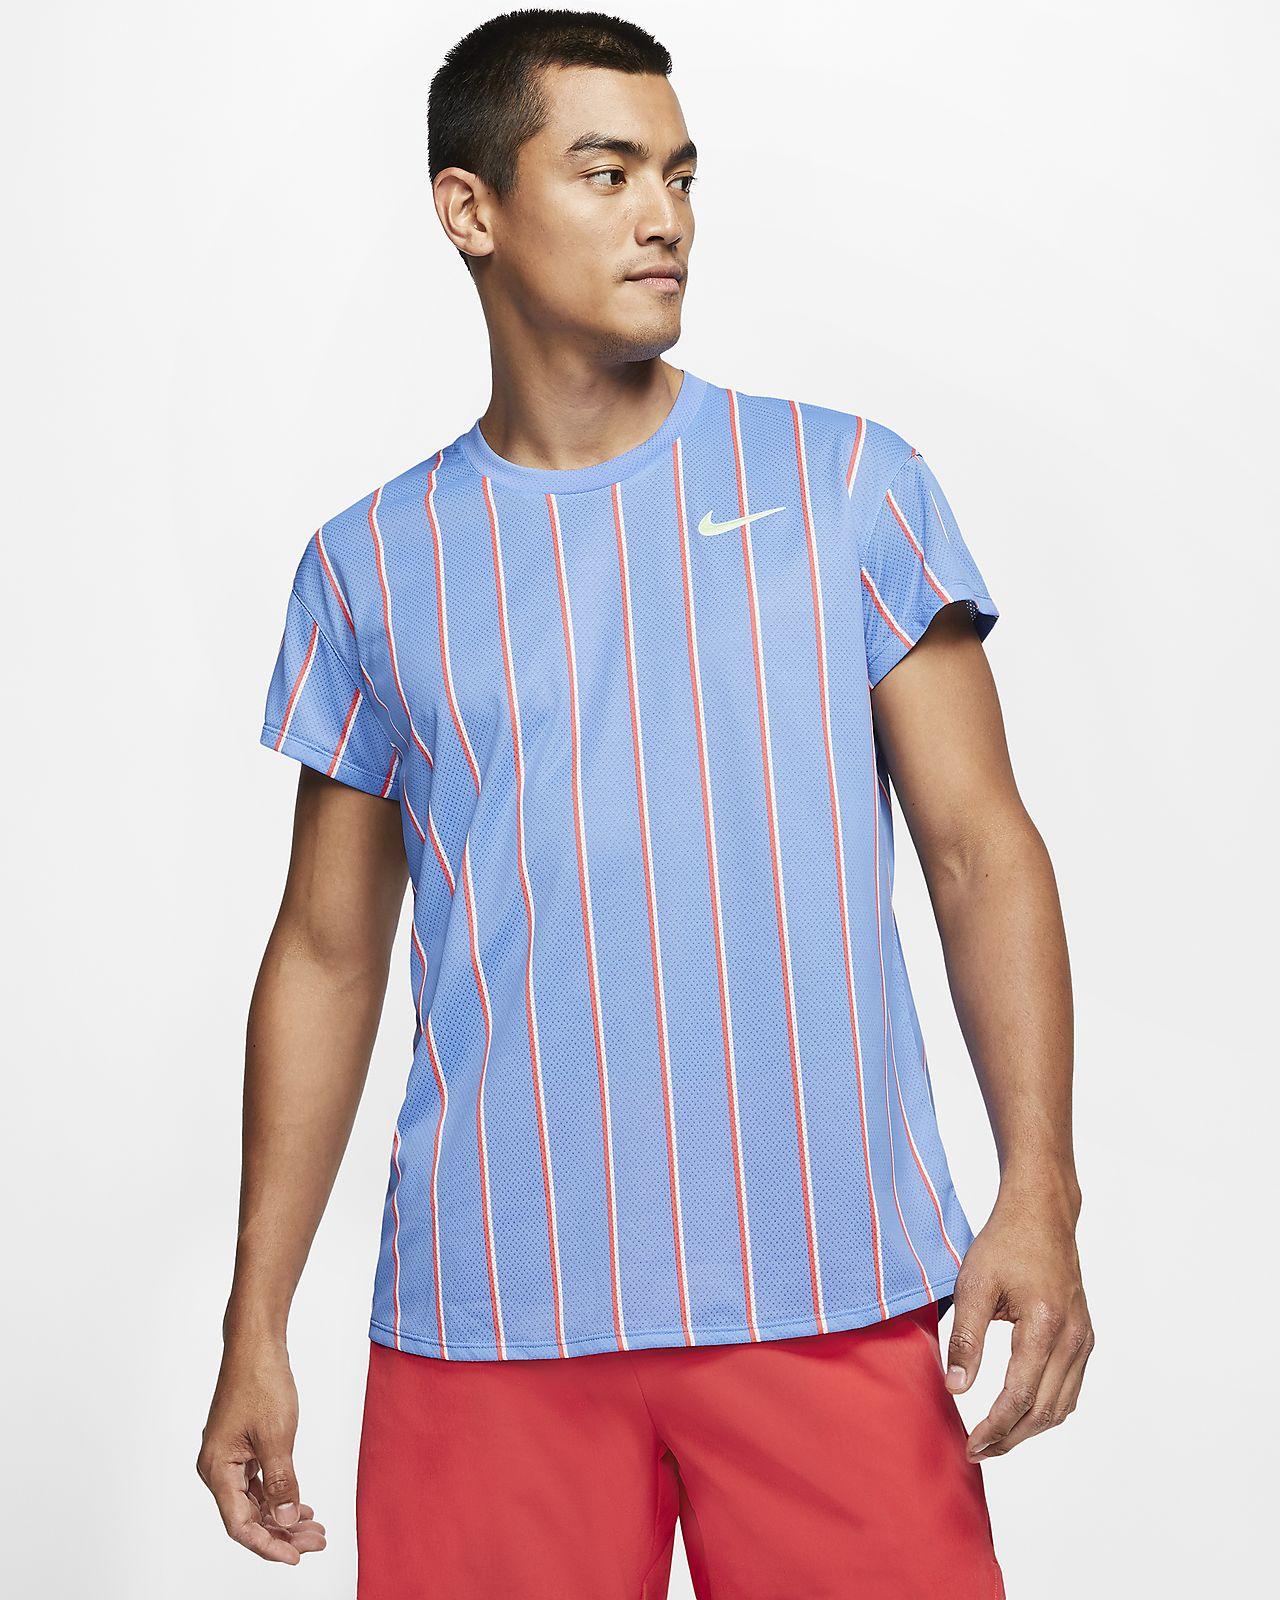 NikeCourt Slam Men's Short-Sleeve Tennis Top